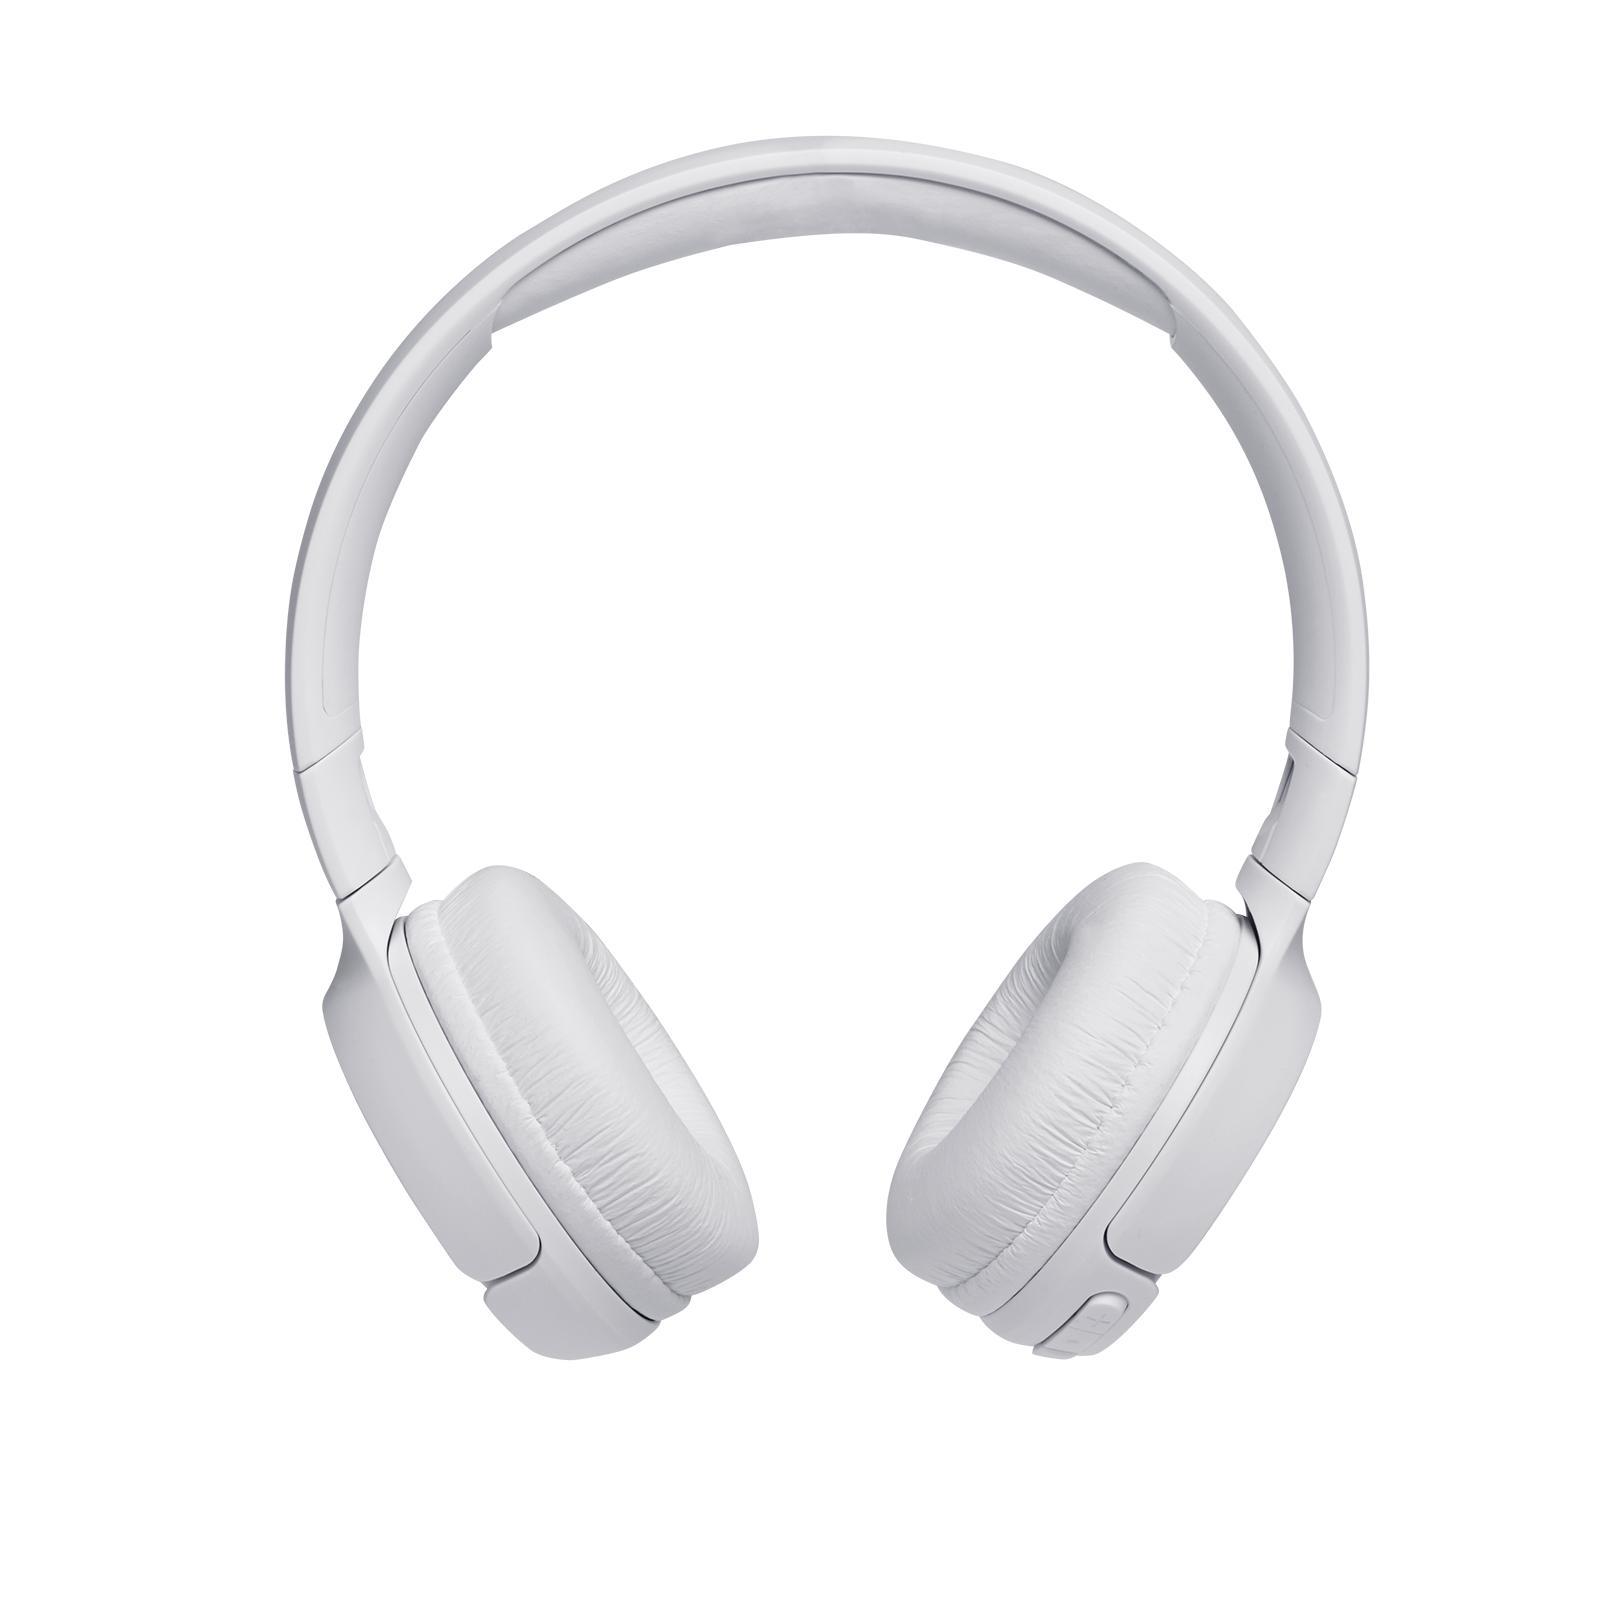 Fone de Ouvido Bluetooth JBL Tune 500BT - Branco JBLT500BTWHT